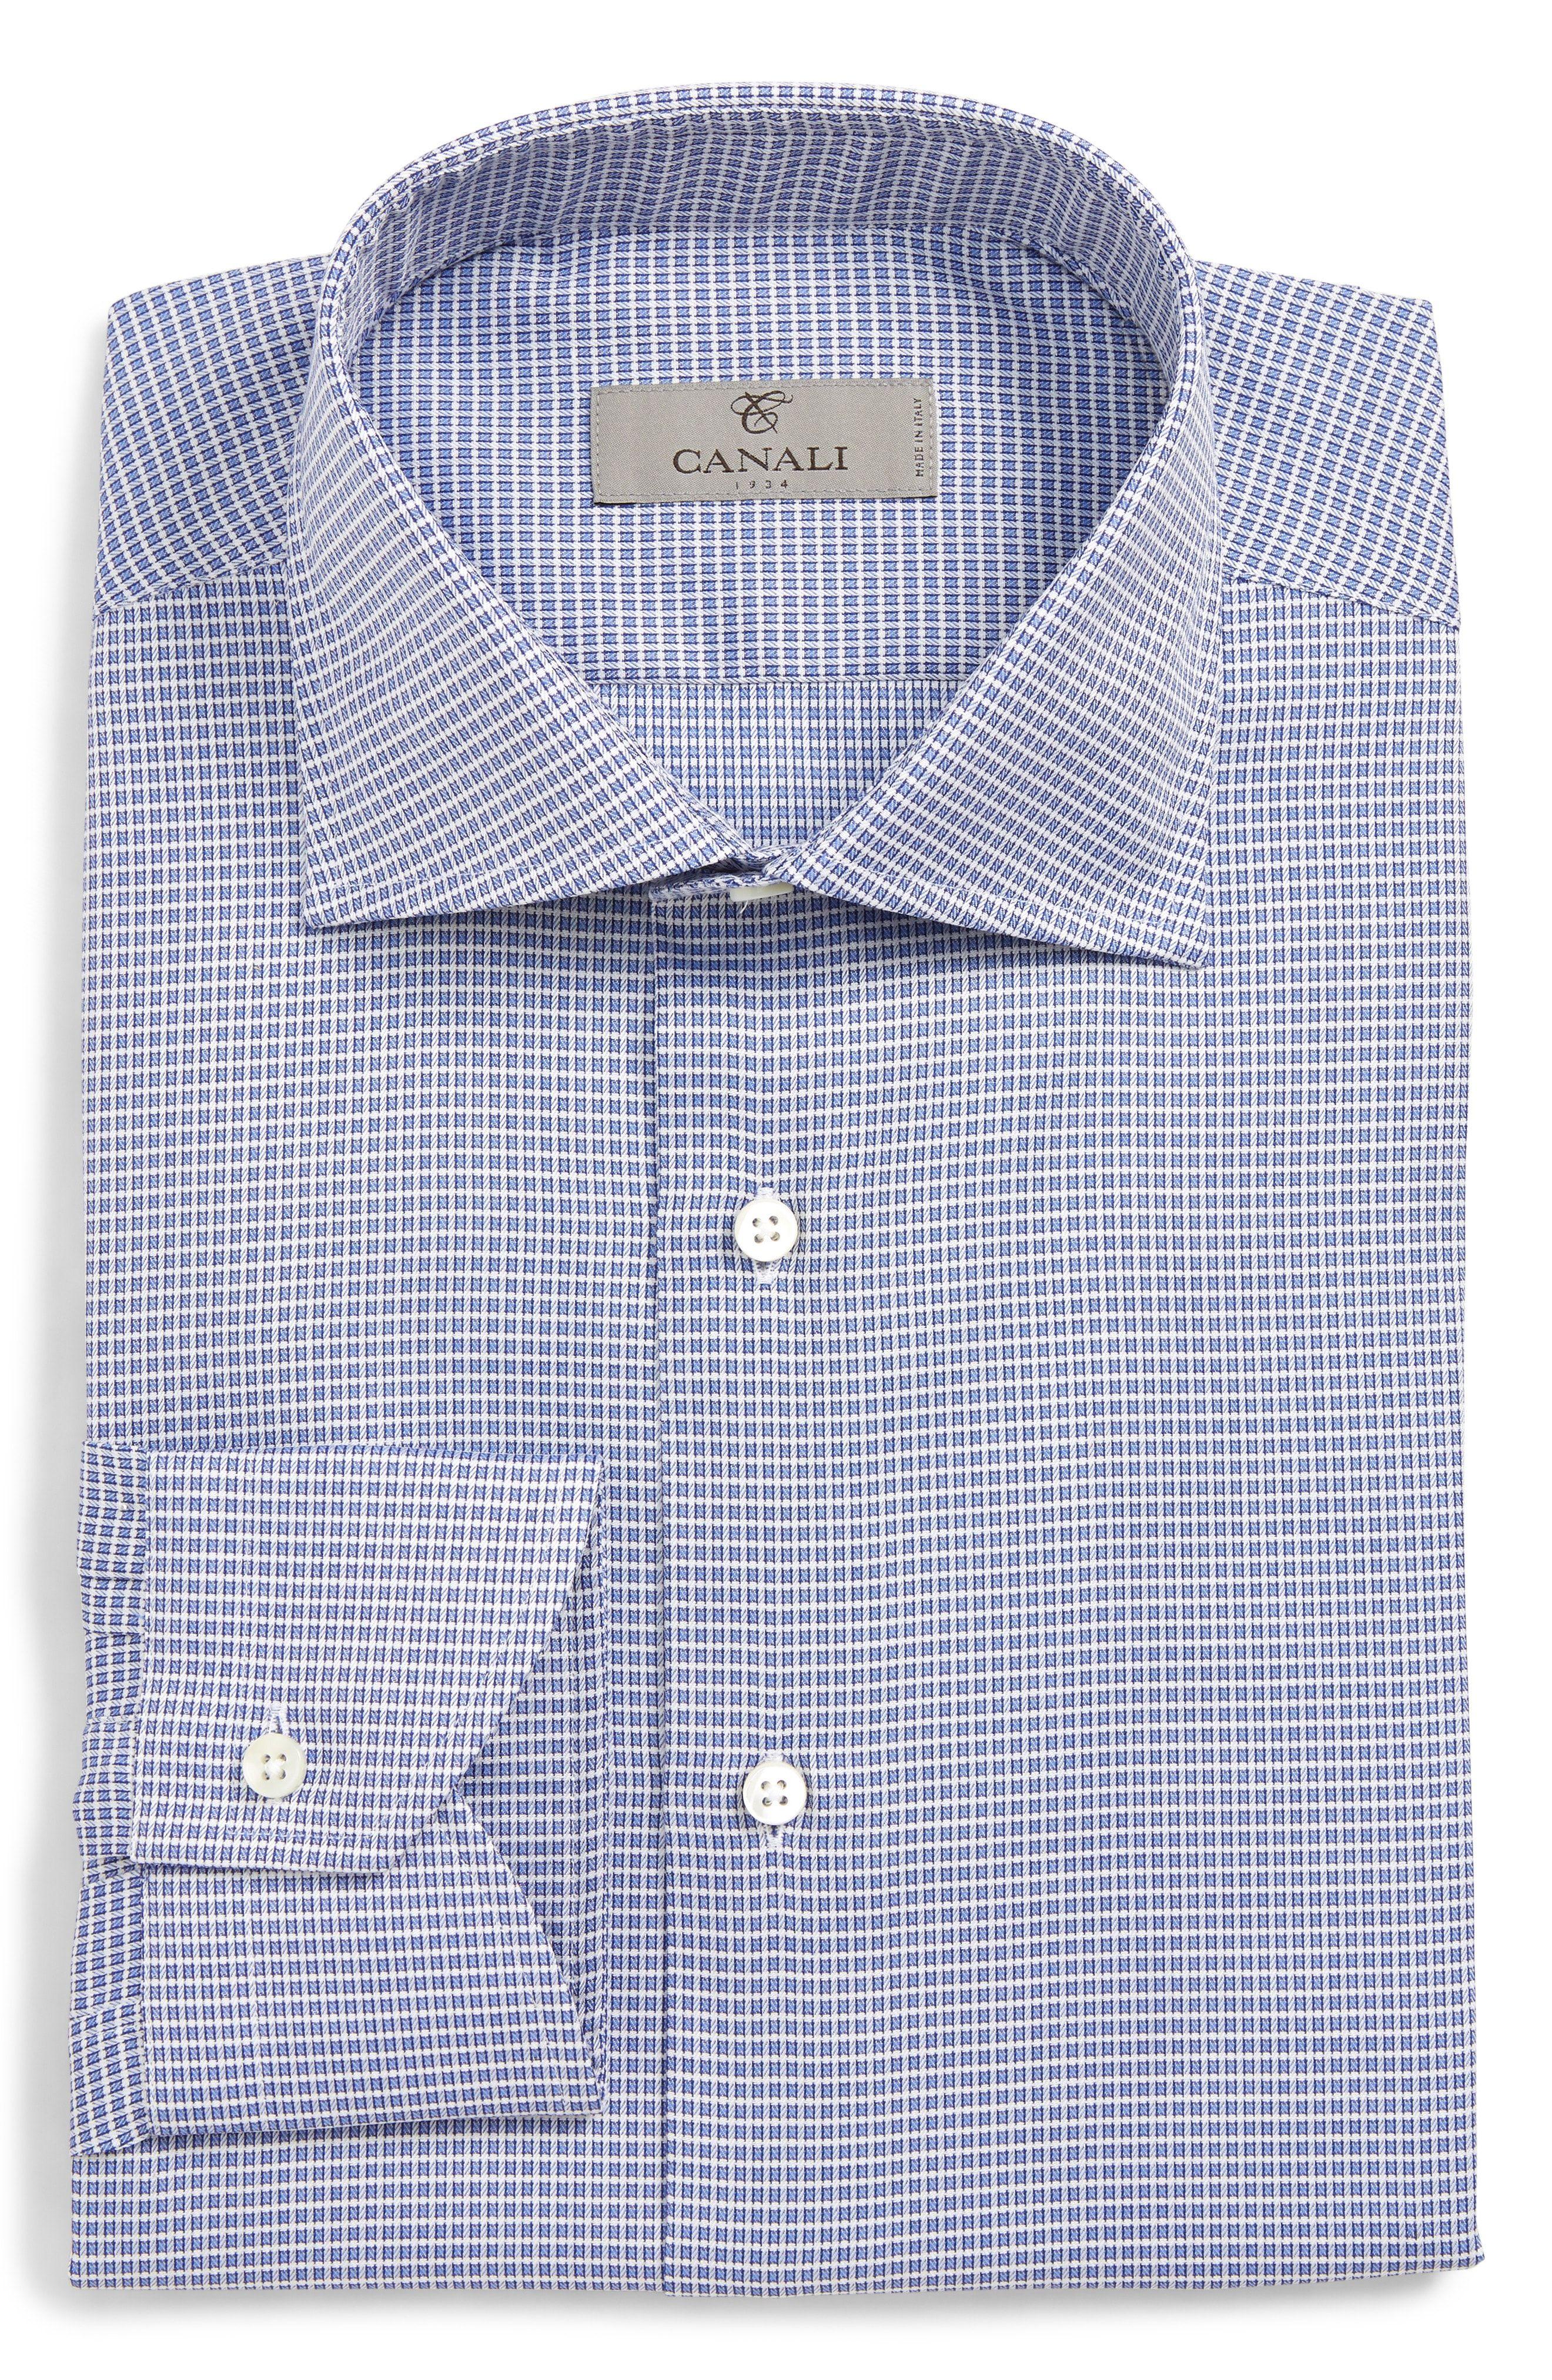 1d2e7654a25 CANALI REGULAR FIT CHECK DRESS SHIRT.  canali  cloth